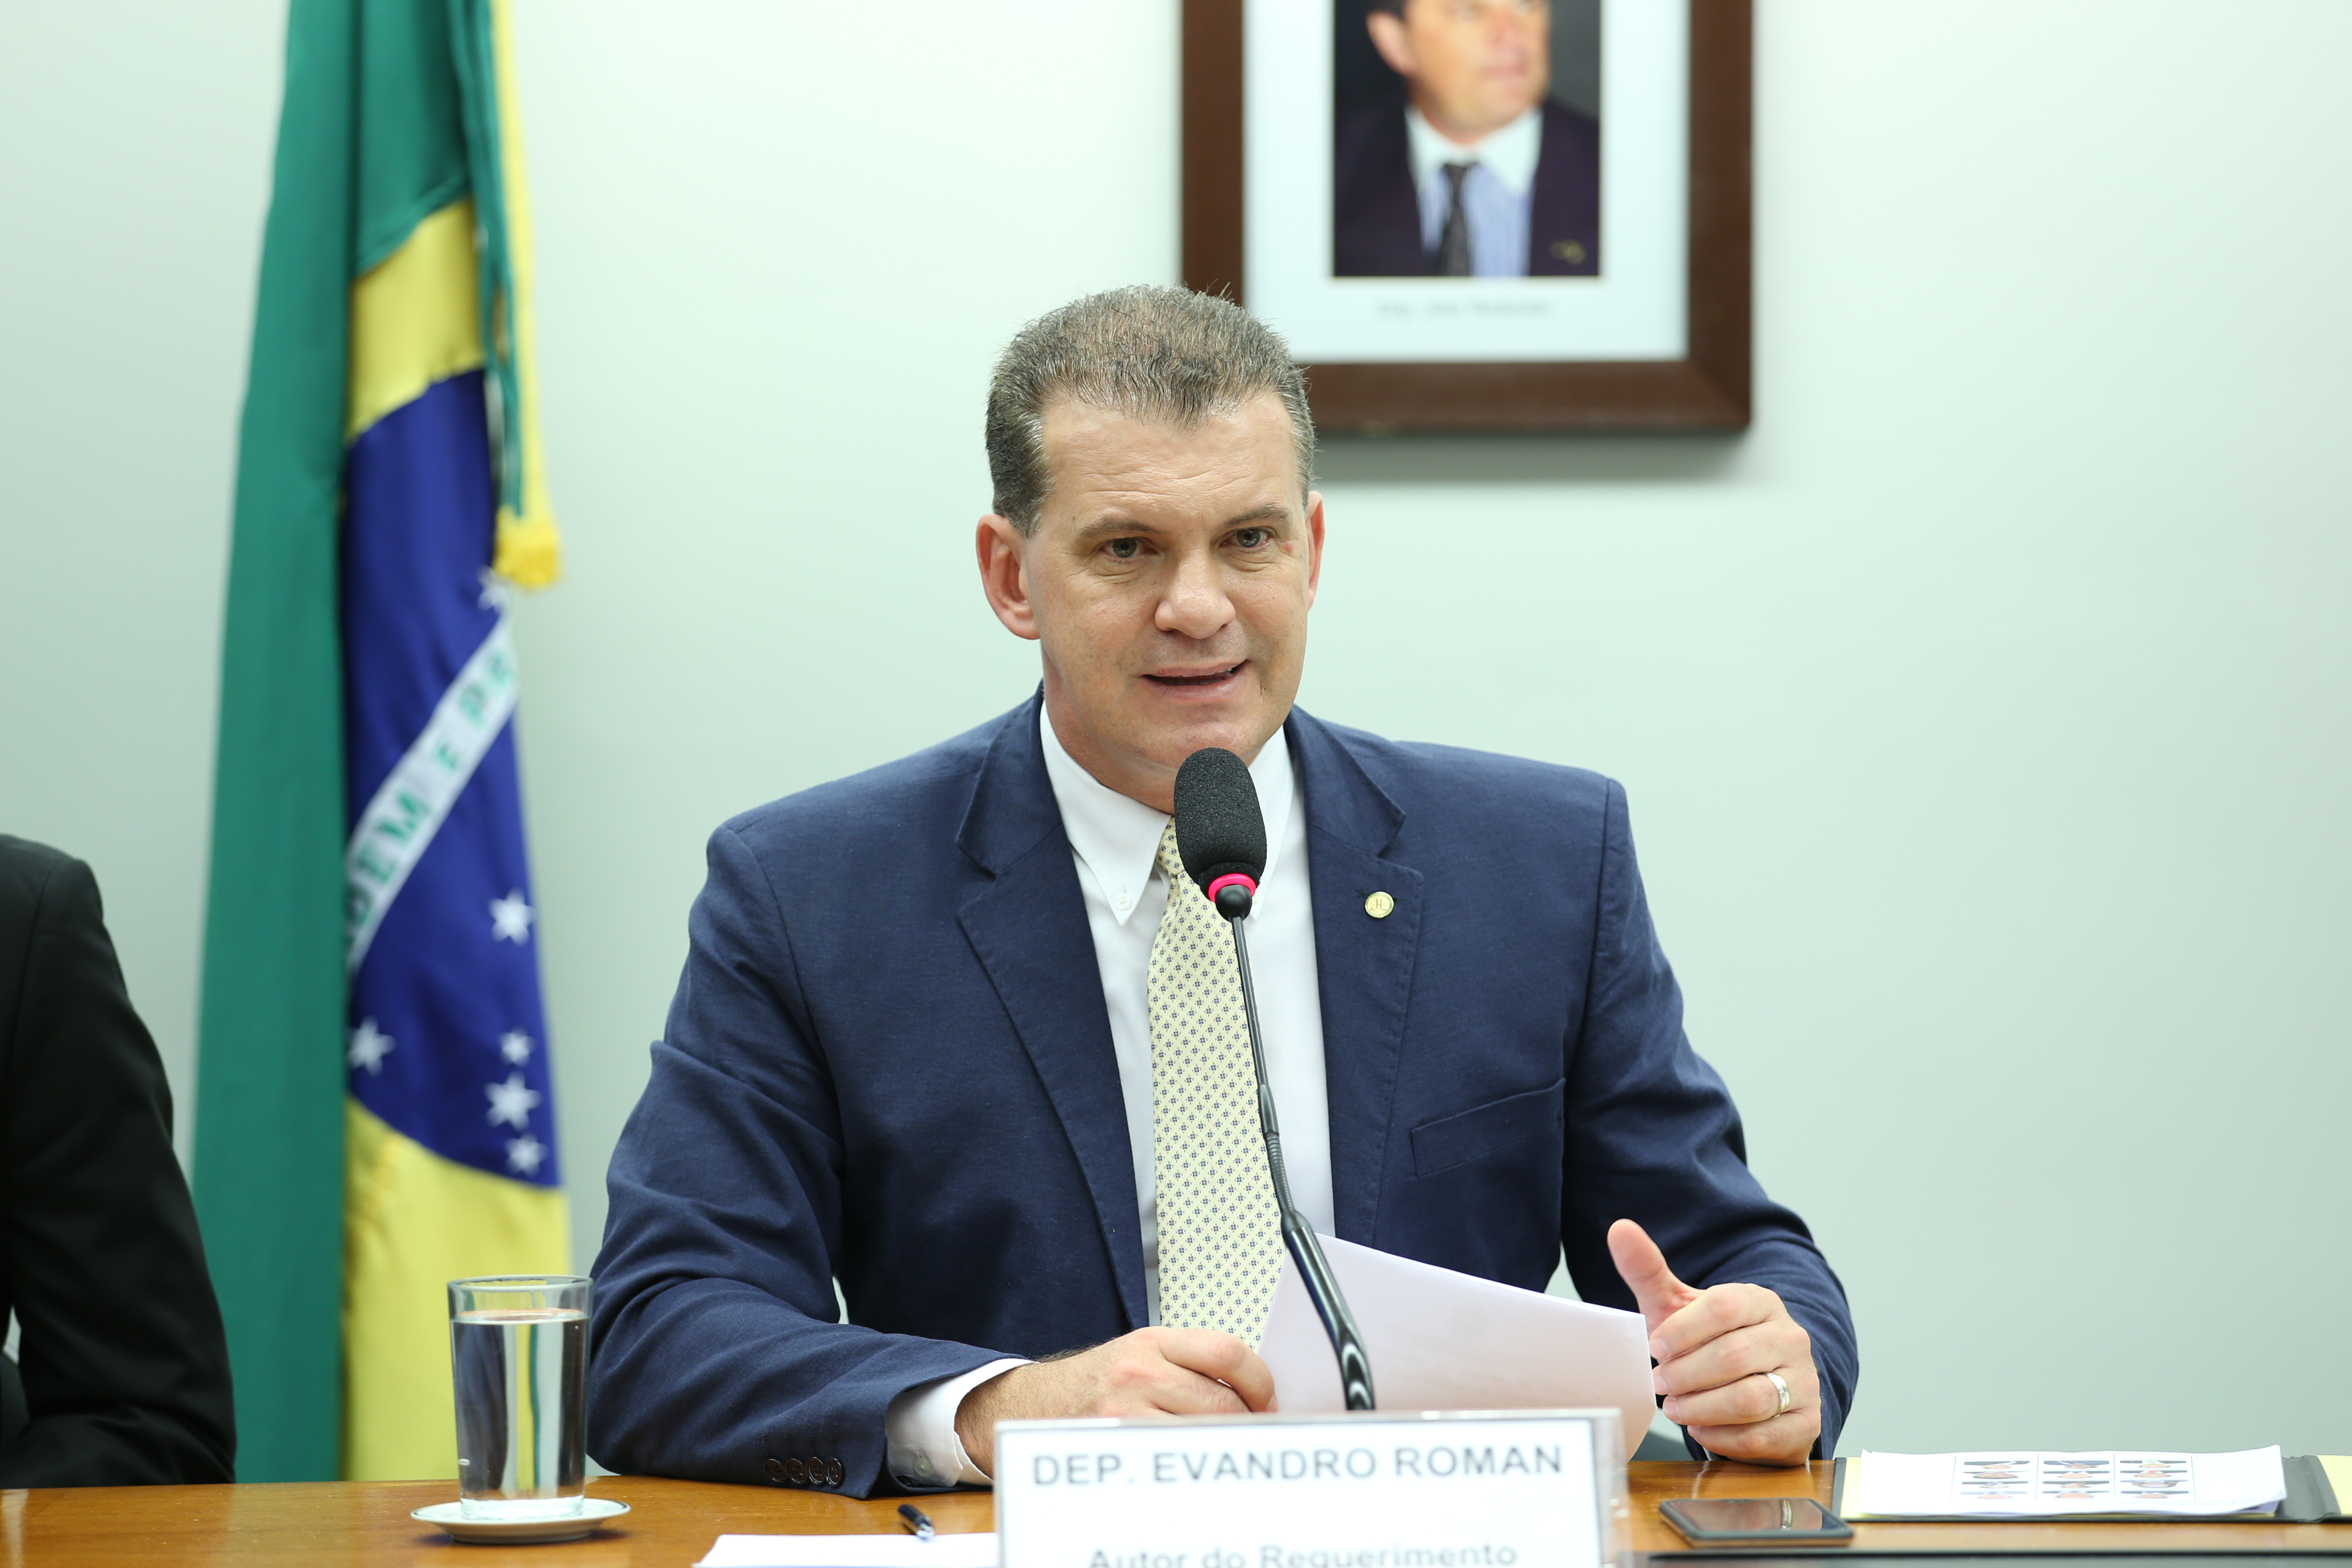 Deputados D - F - Evandro Roman